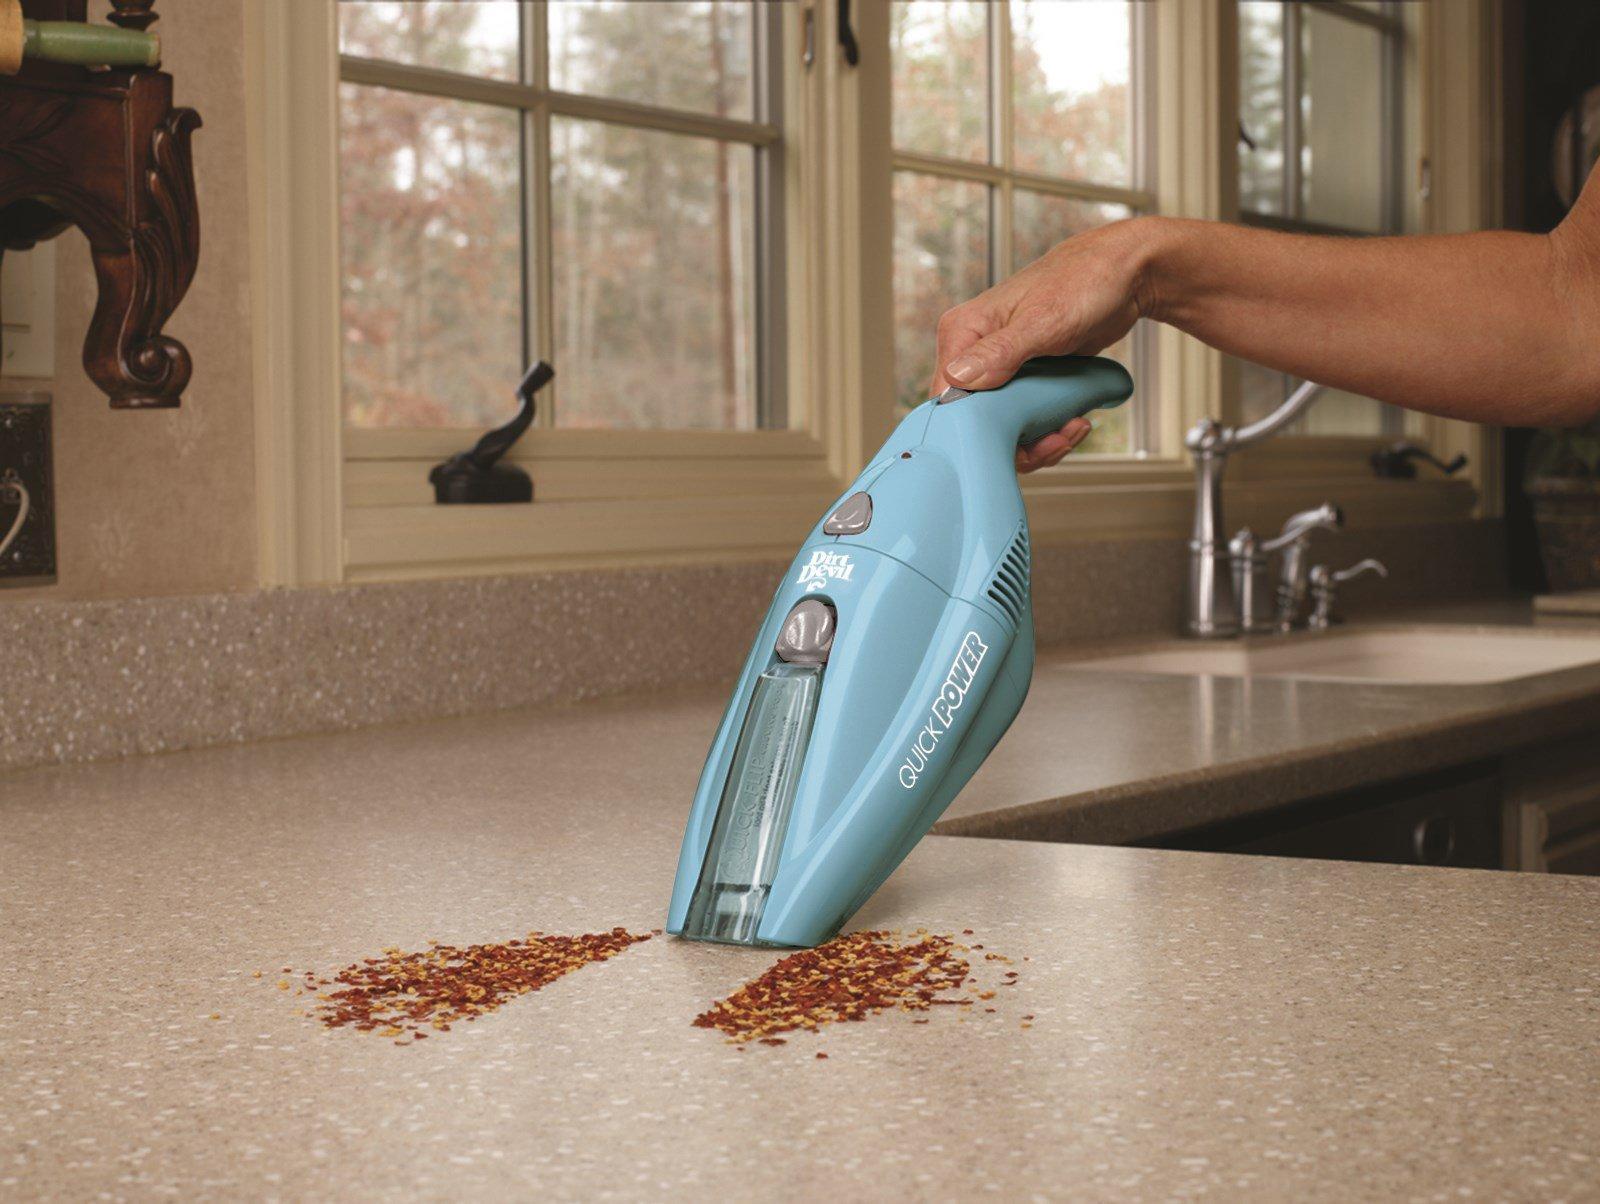 Quick Power 7.2V Cordless Hand Vacuum3